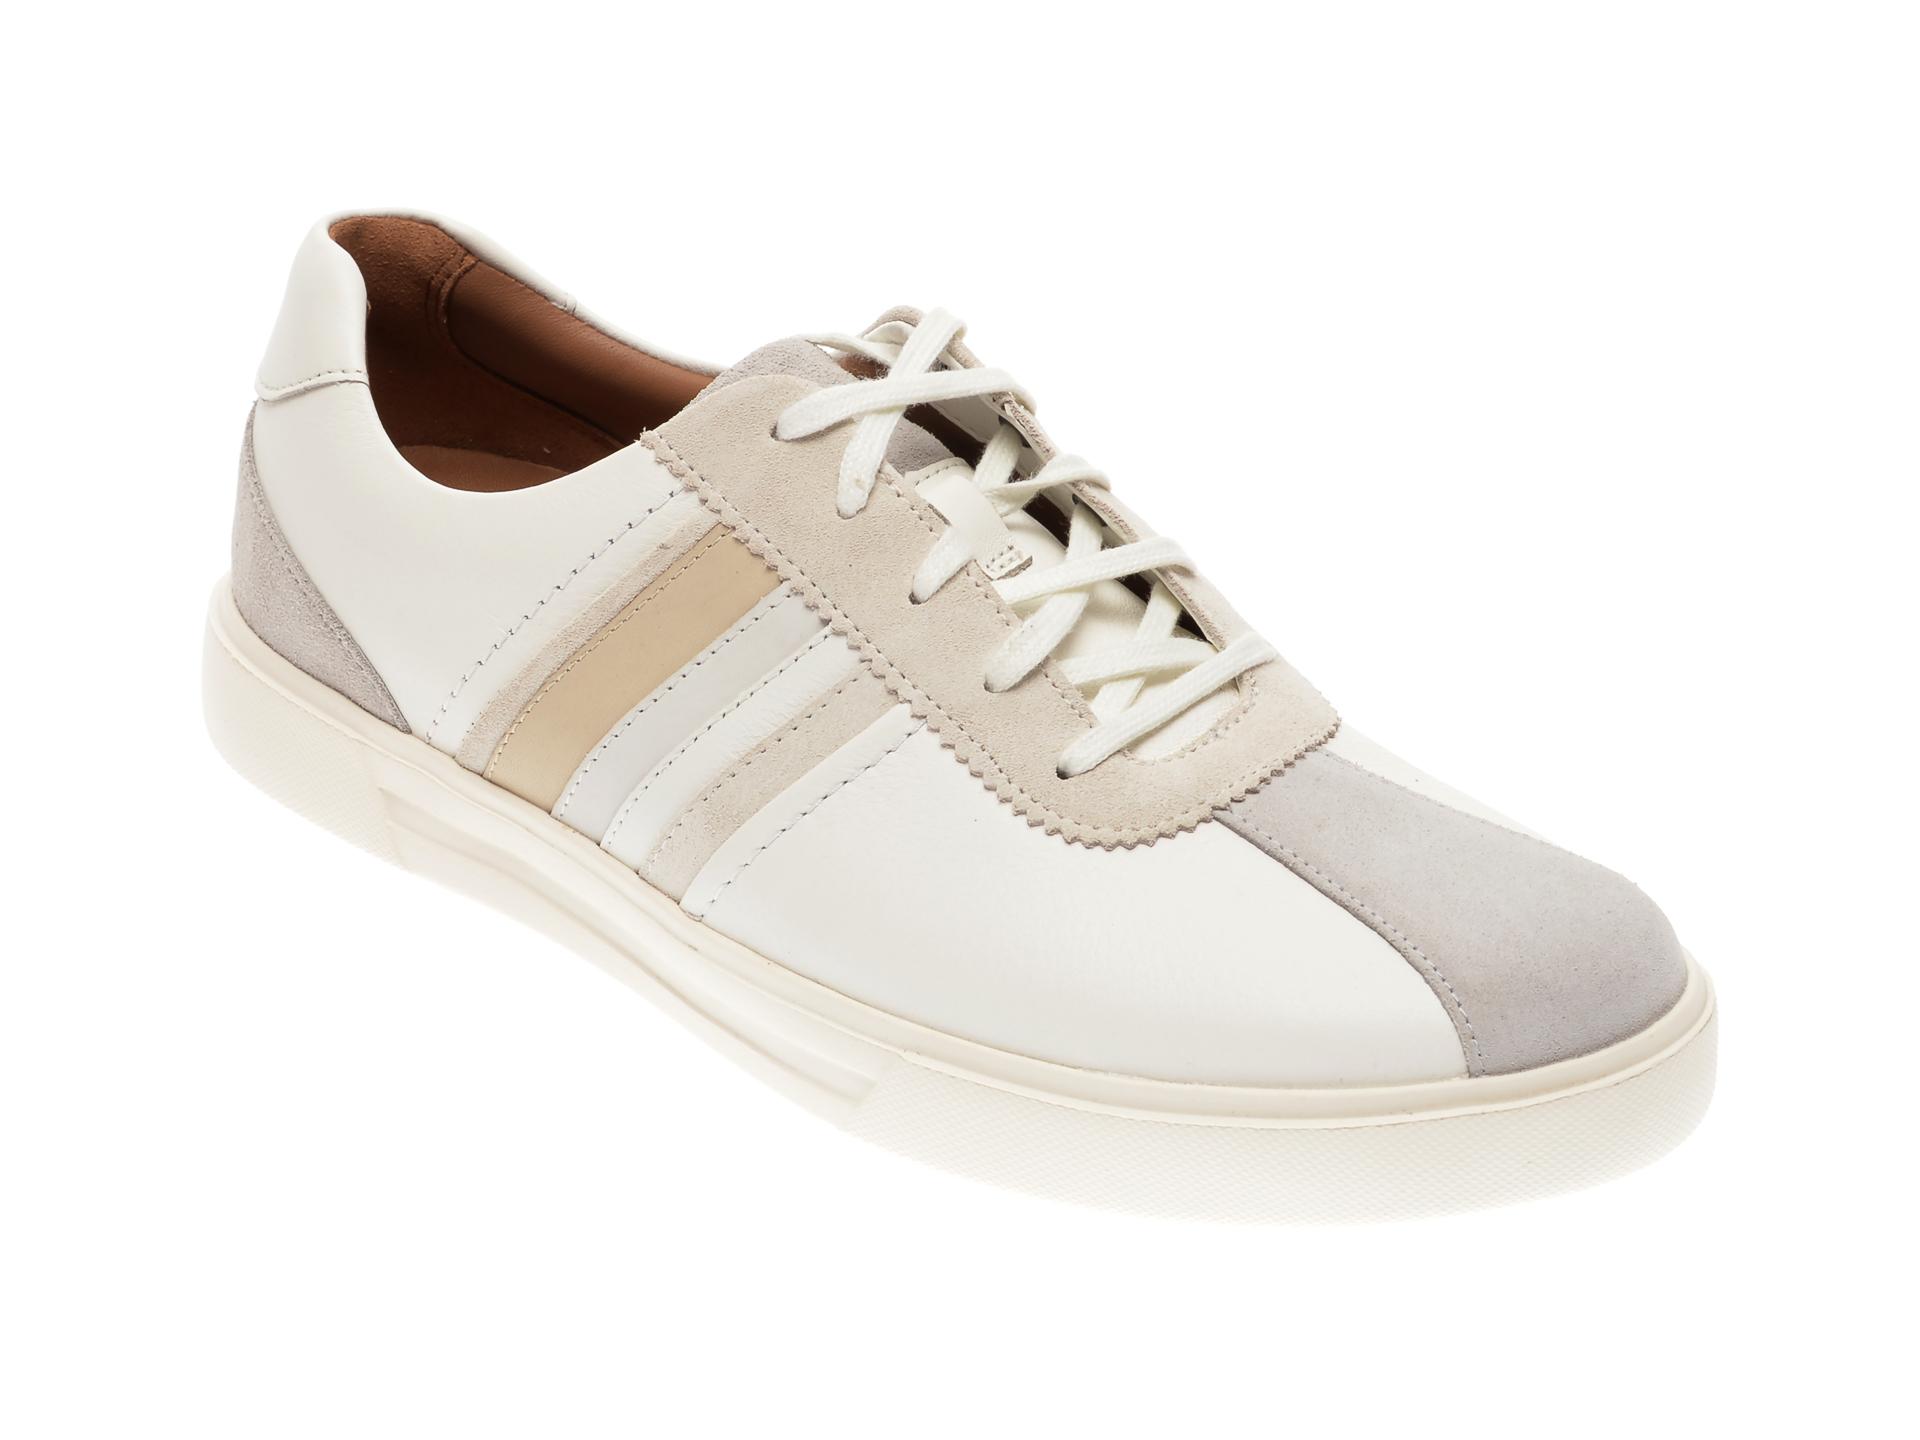 Pantofi CLARKS albi, Un Costa Band, din piele naturala imagine